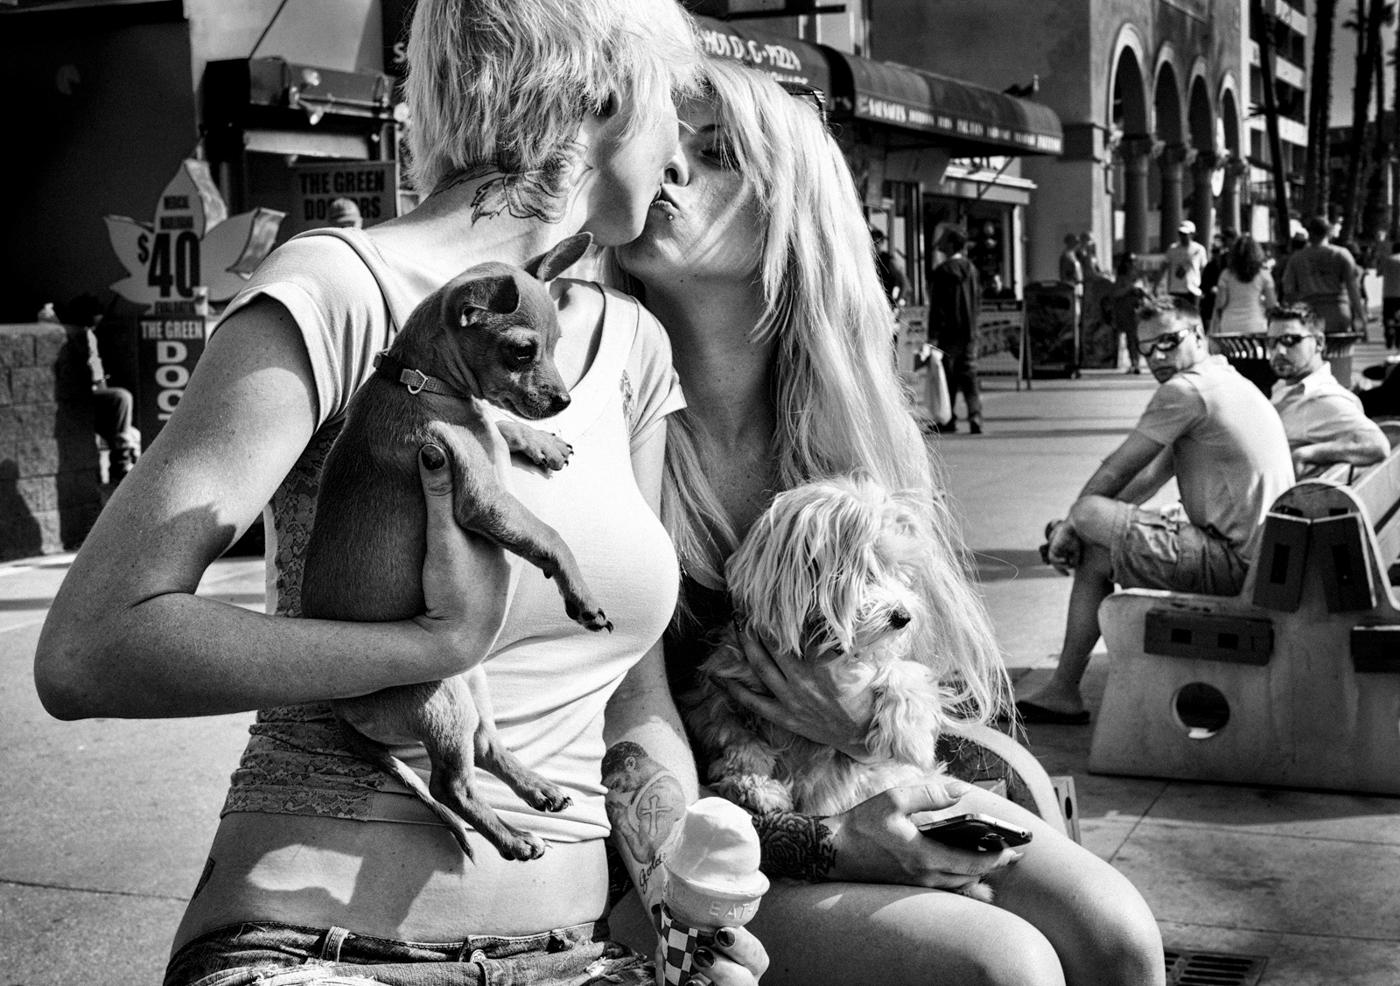 Venice Kiss – Venice, CA